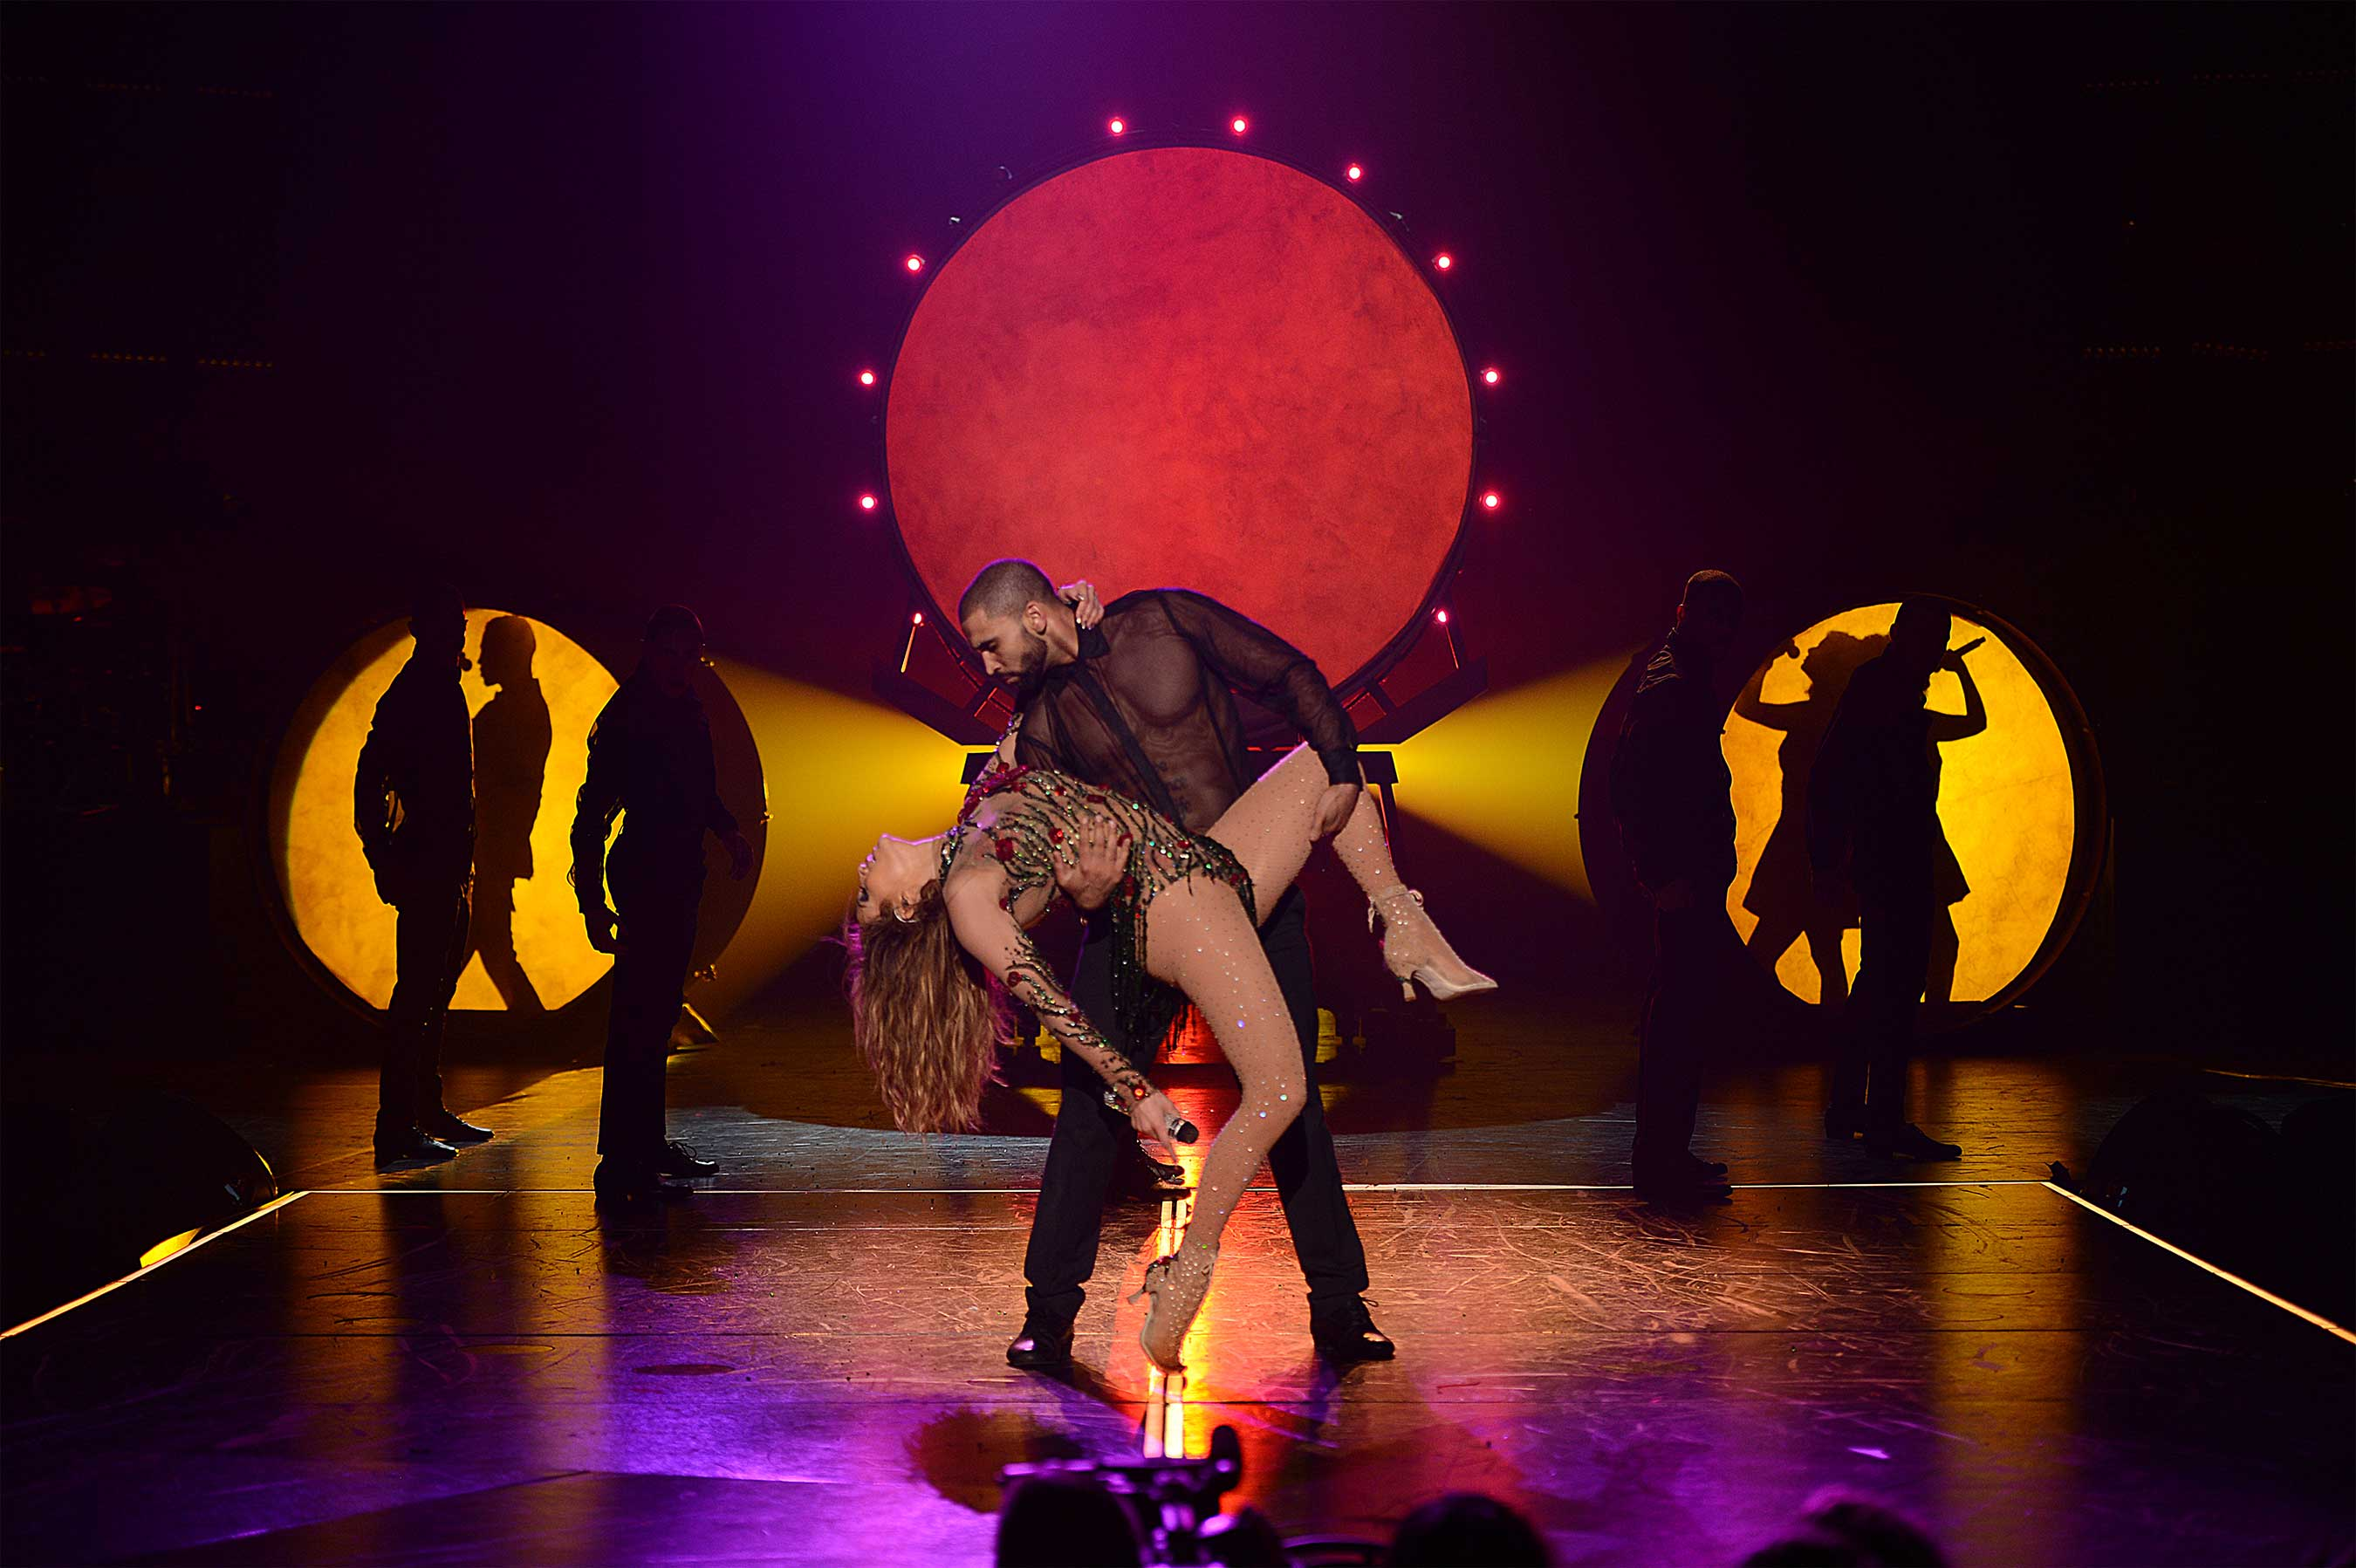 Jennifer Lopez debuts her new Las Vegas headlining residency show JENNIFER LOPEZ: ALL I HAVE at Planet Hollywood Resort & Casino. Photo Credit - Denise Truscello